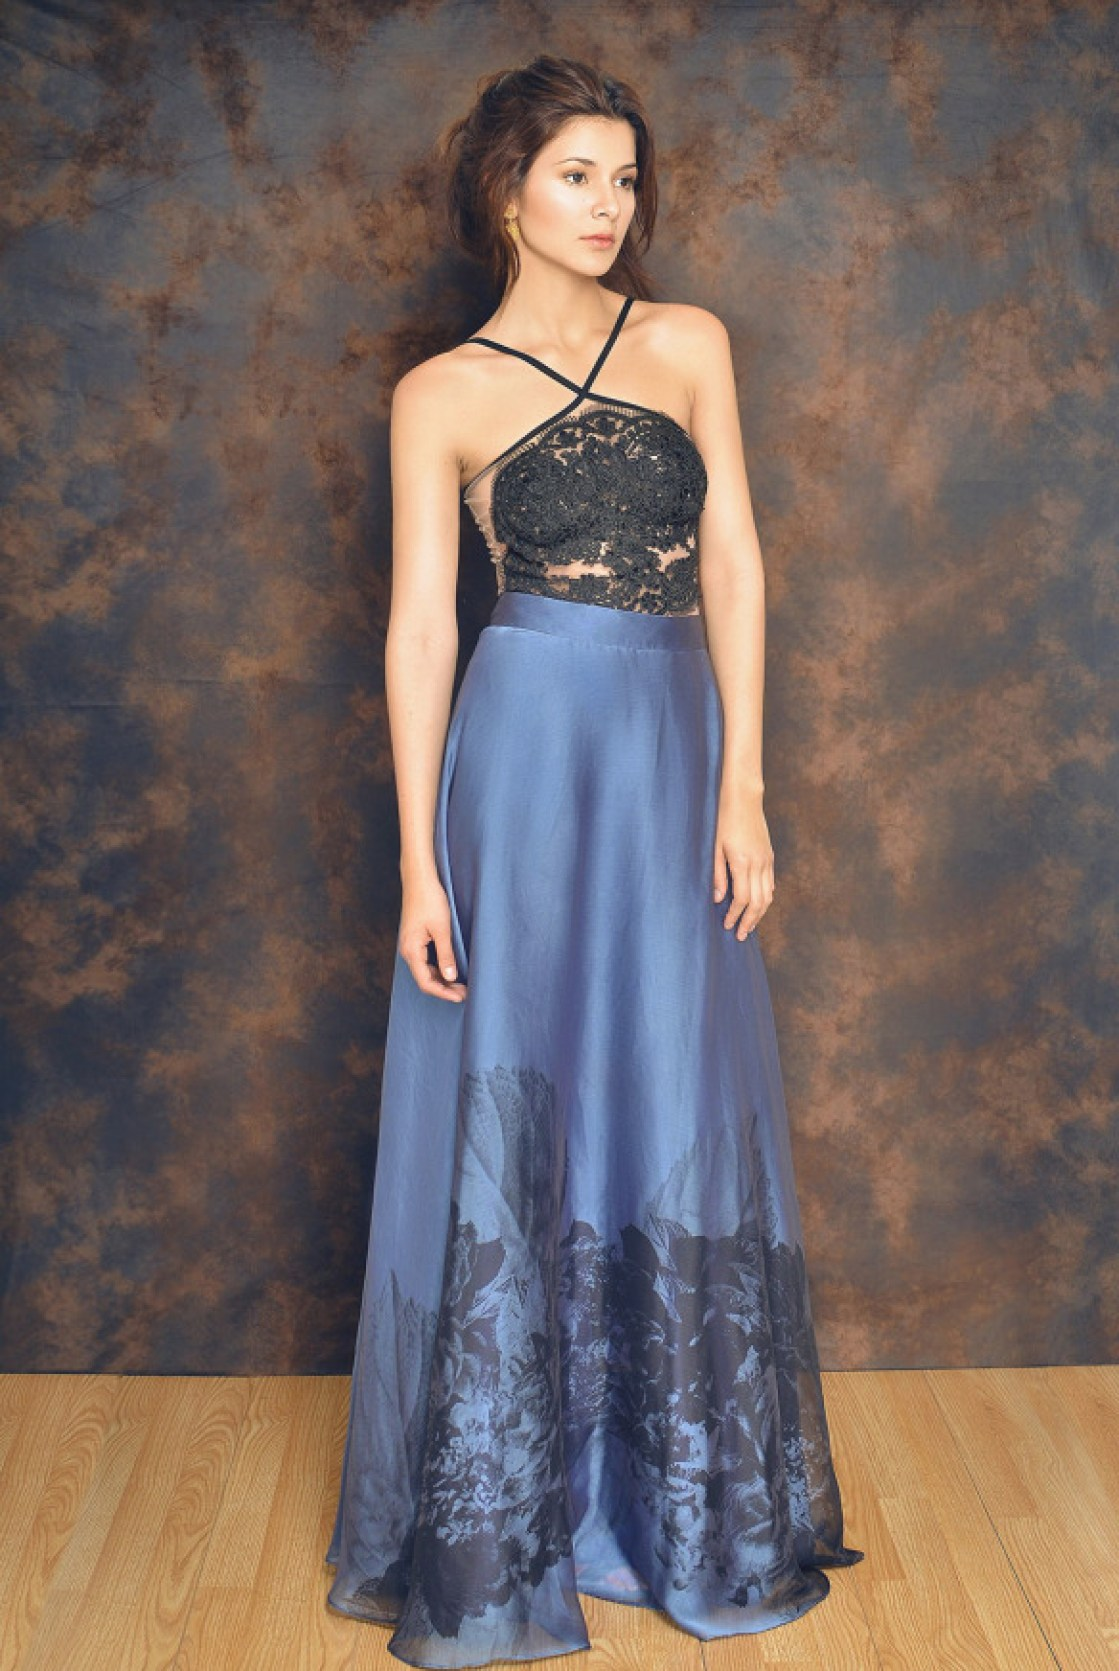 19-fashion-campaign-kwmariakarina-danielastyling-fashion-editorials-styling-stylist-fashion-blog-2